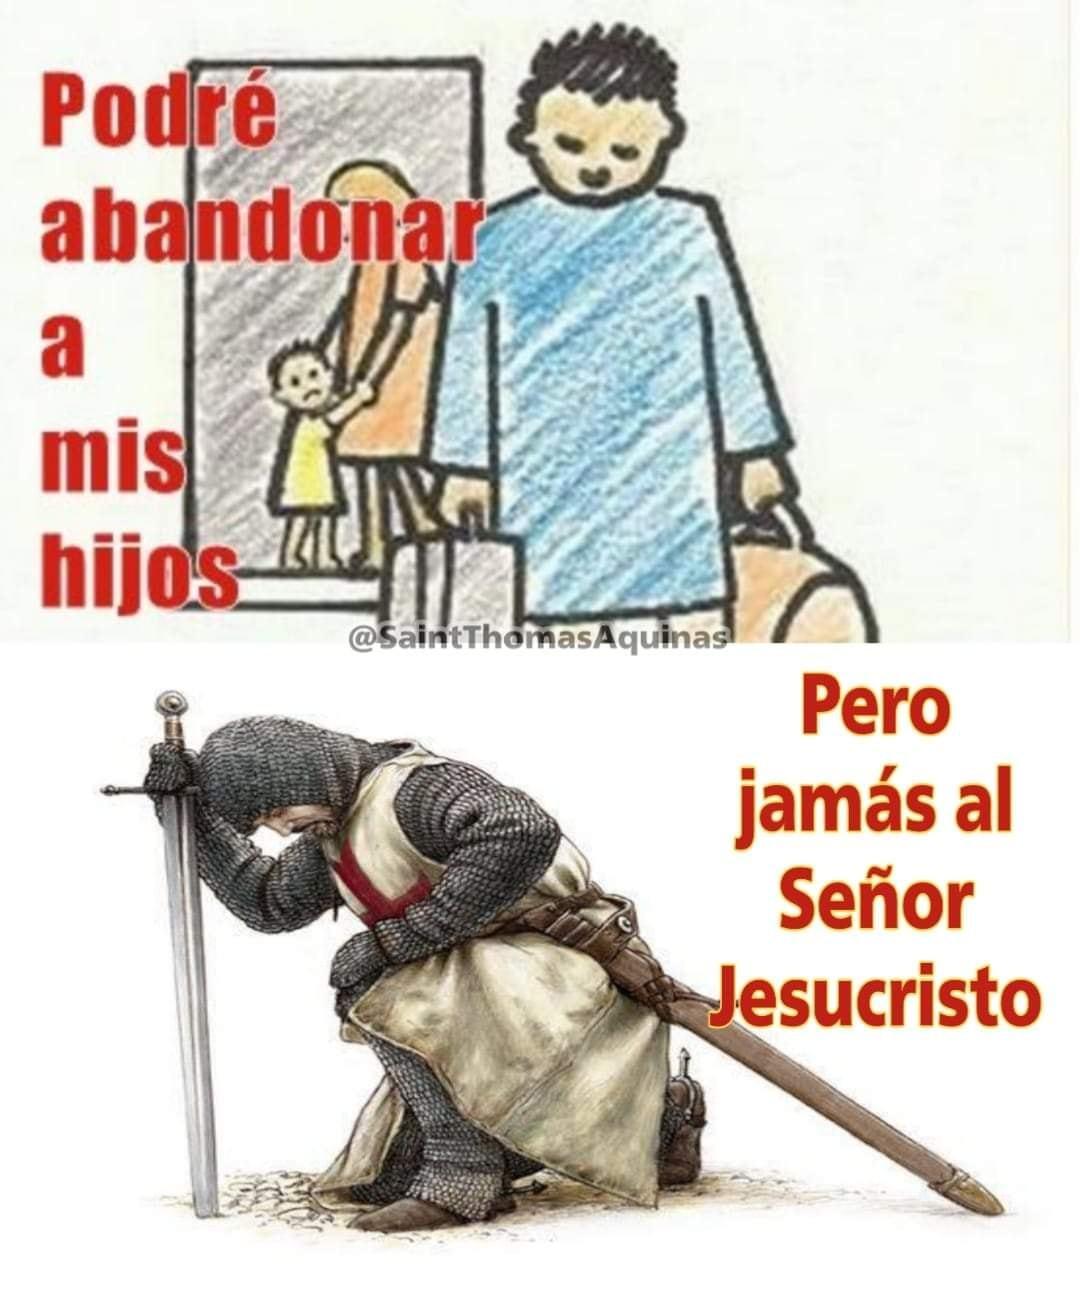 vida Saludable 1°A 3ro Secundaria Pearson - meme